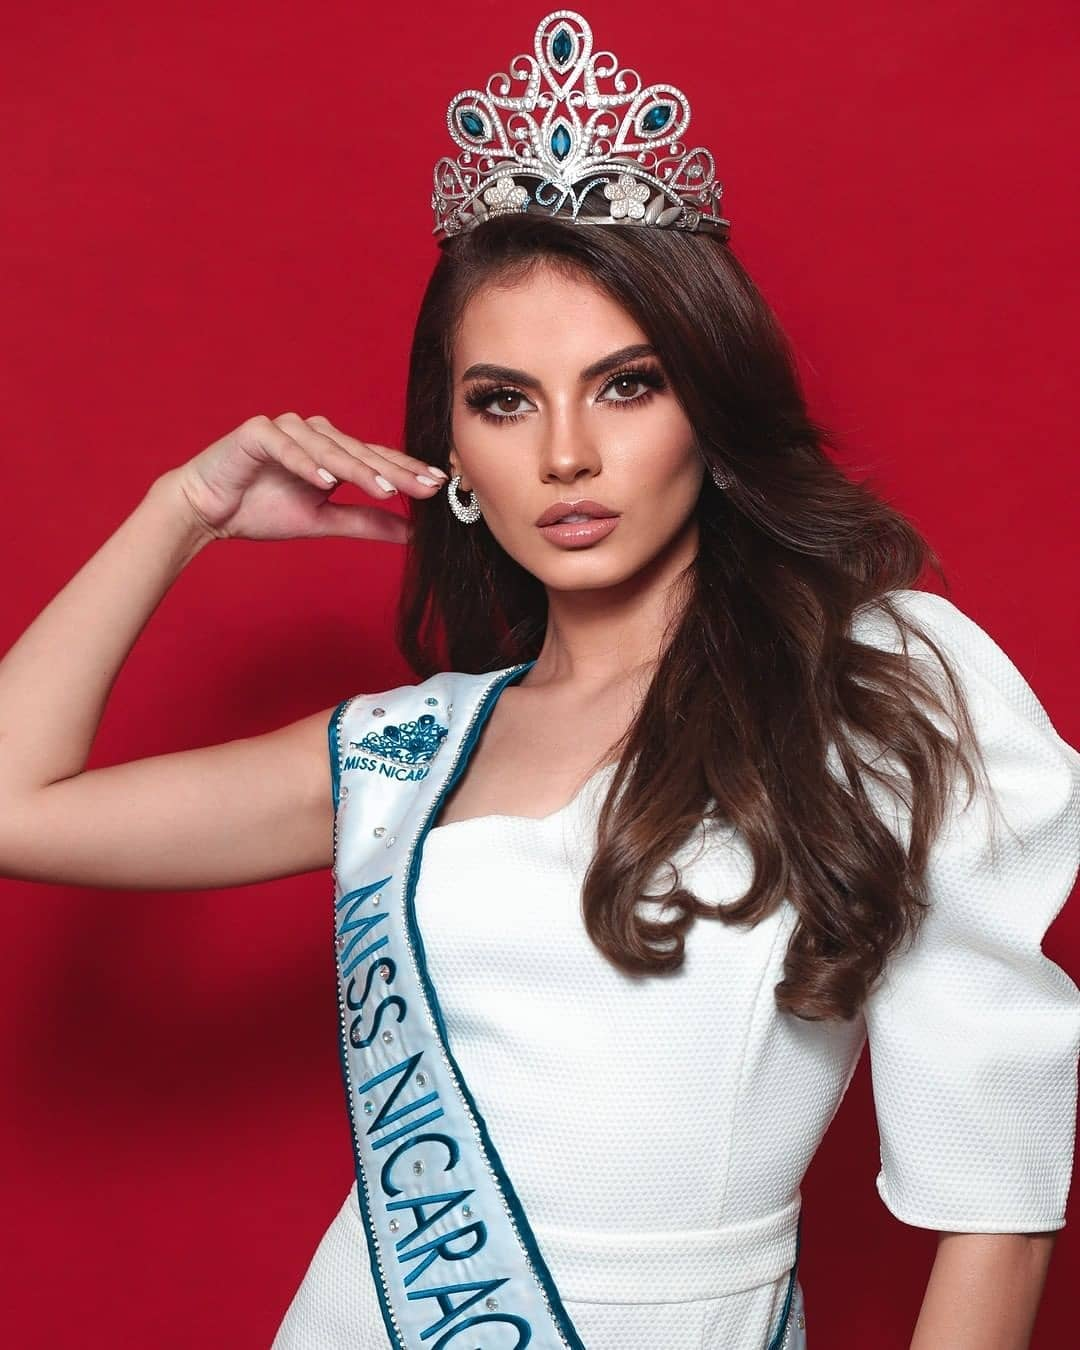 official de miss nicaragua 2020. UDnPNu